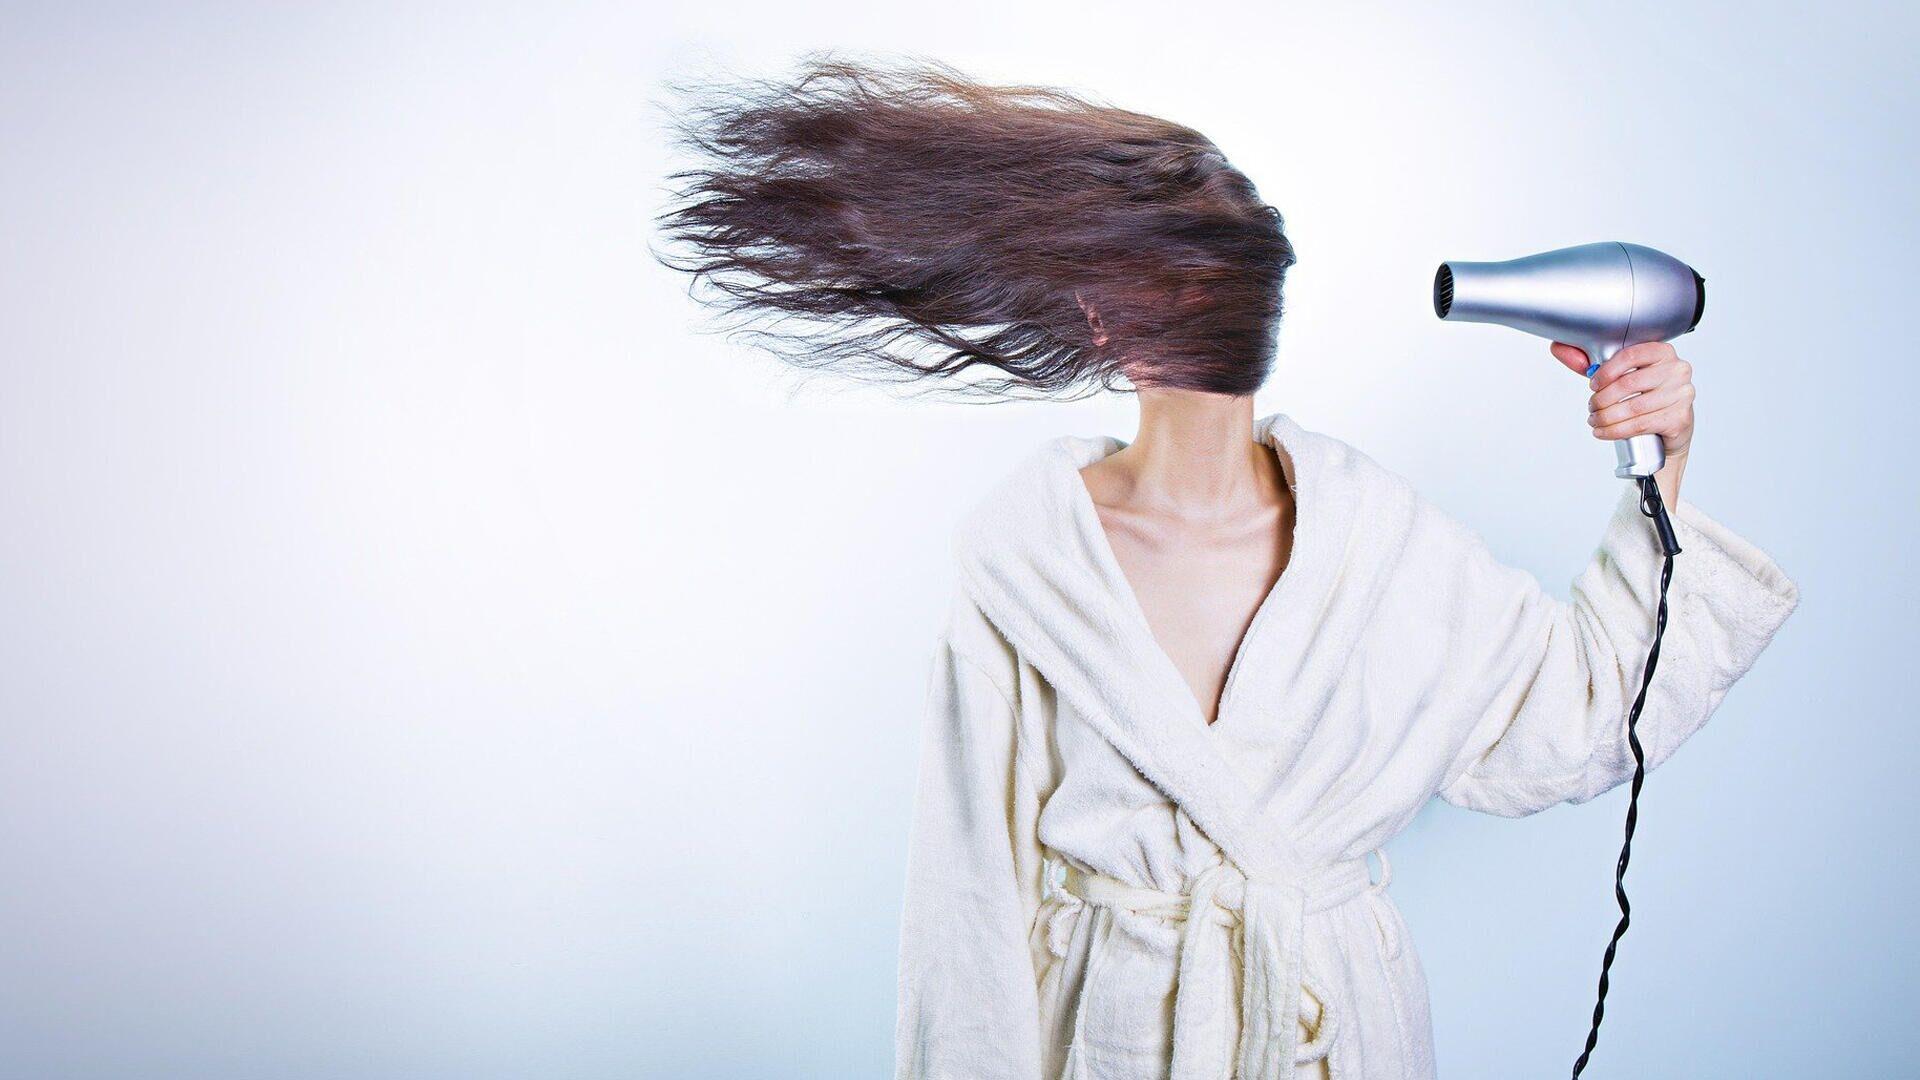 Donna che si asciuga i capelli - Immagine metaforica - Sputnik Italia, 1920, 27.09.2021